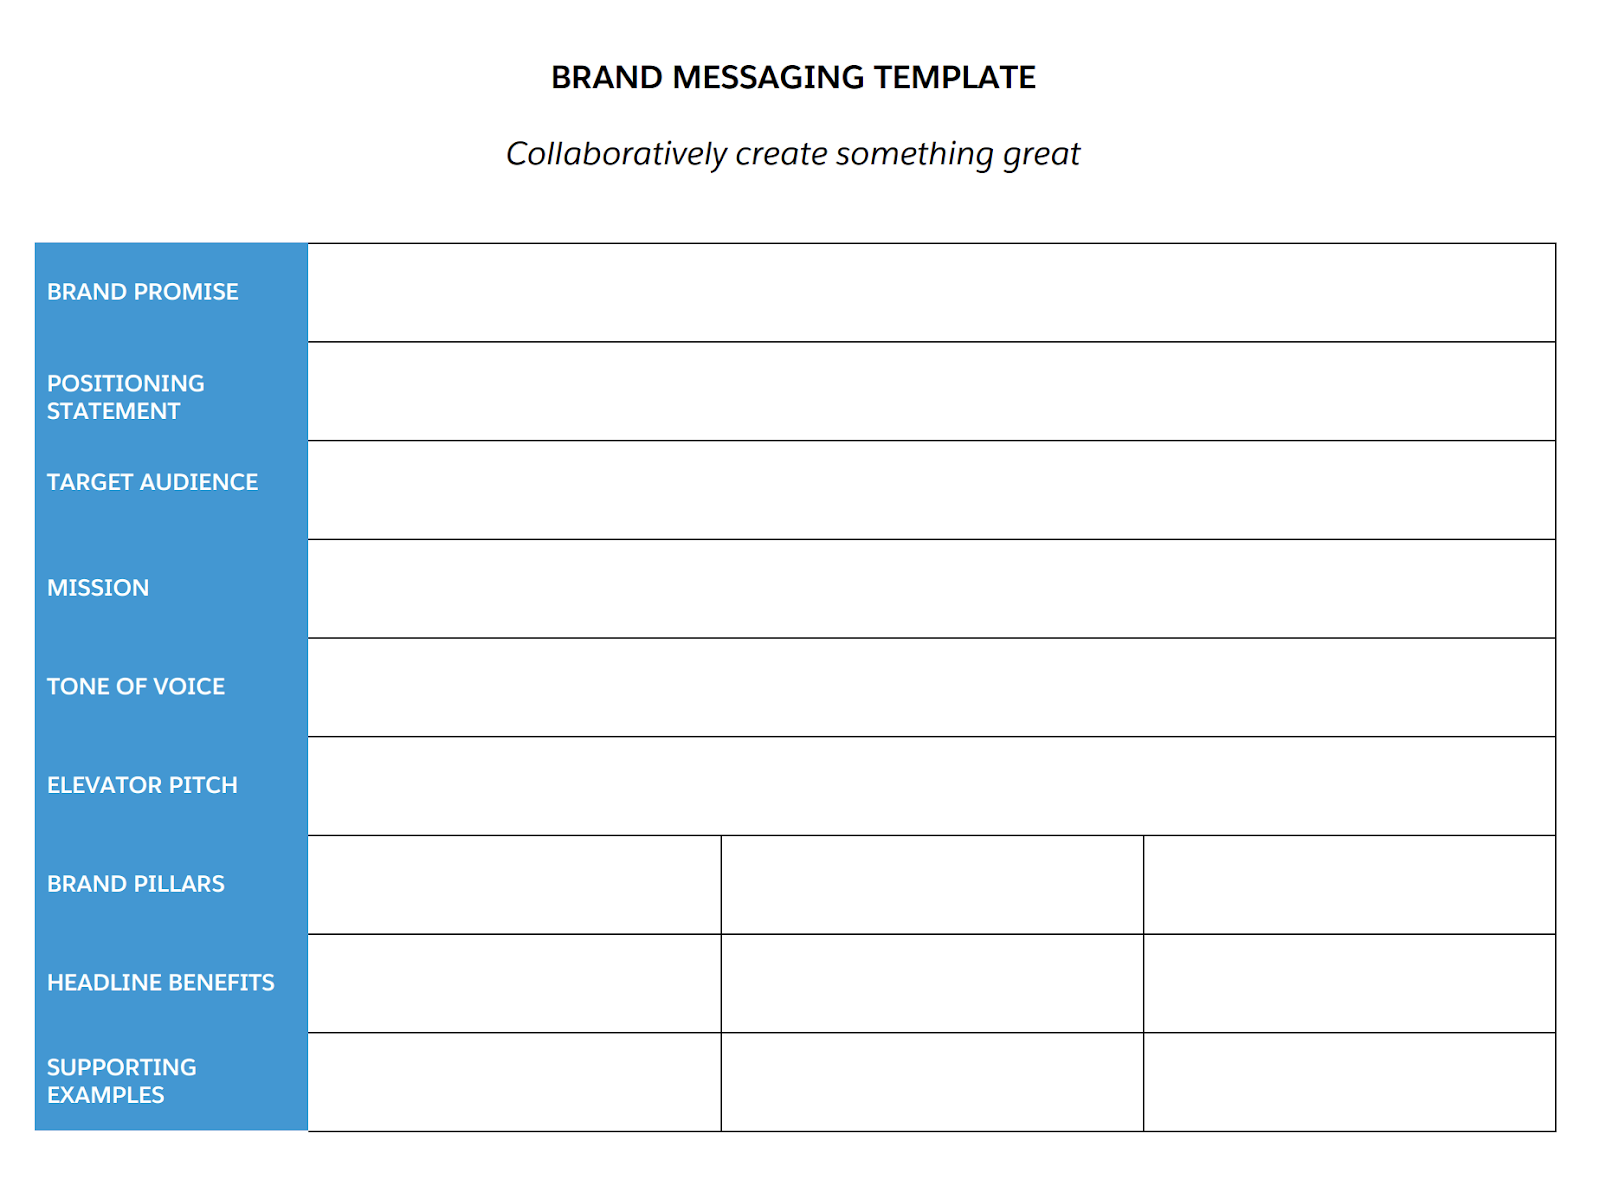 Brand messaging template from Pardot